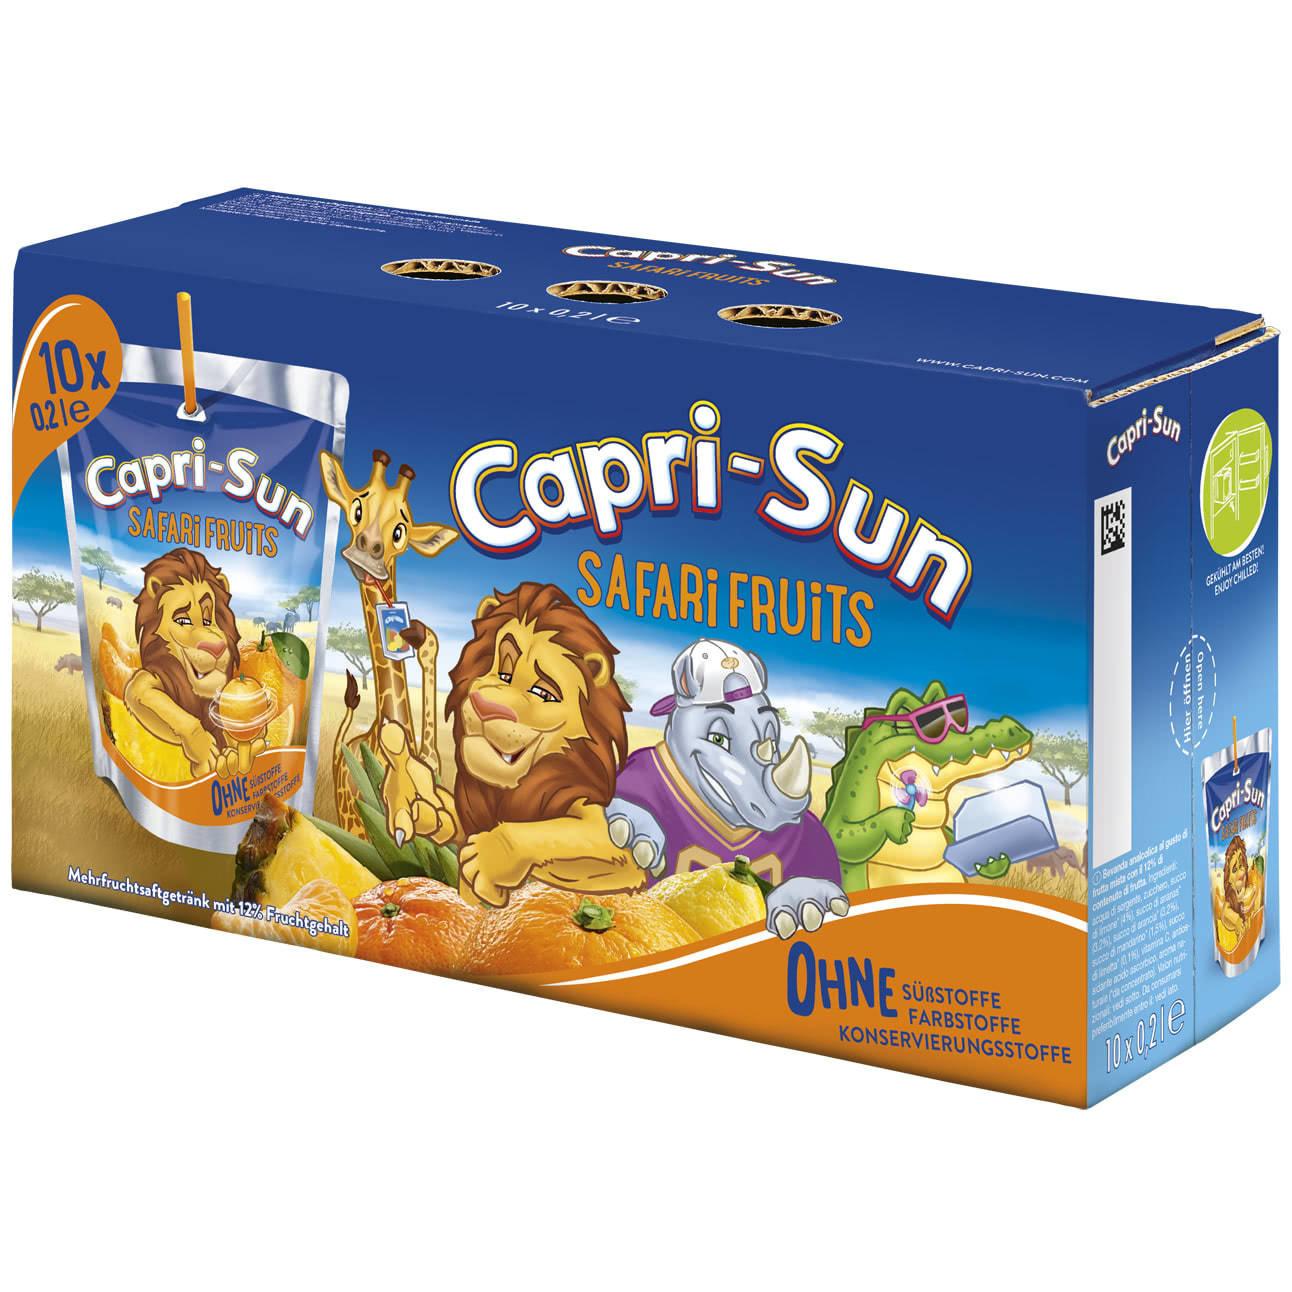 Capri-Son Capri-Sun - Safari Fruits 200ml 10-Pack